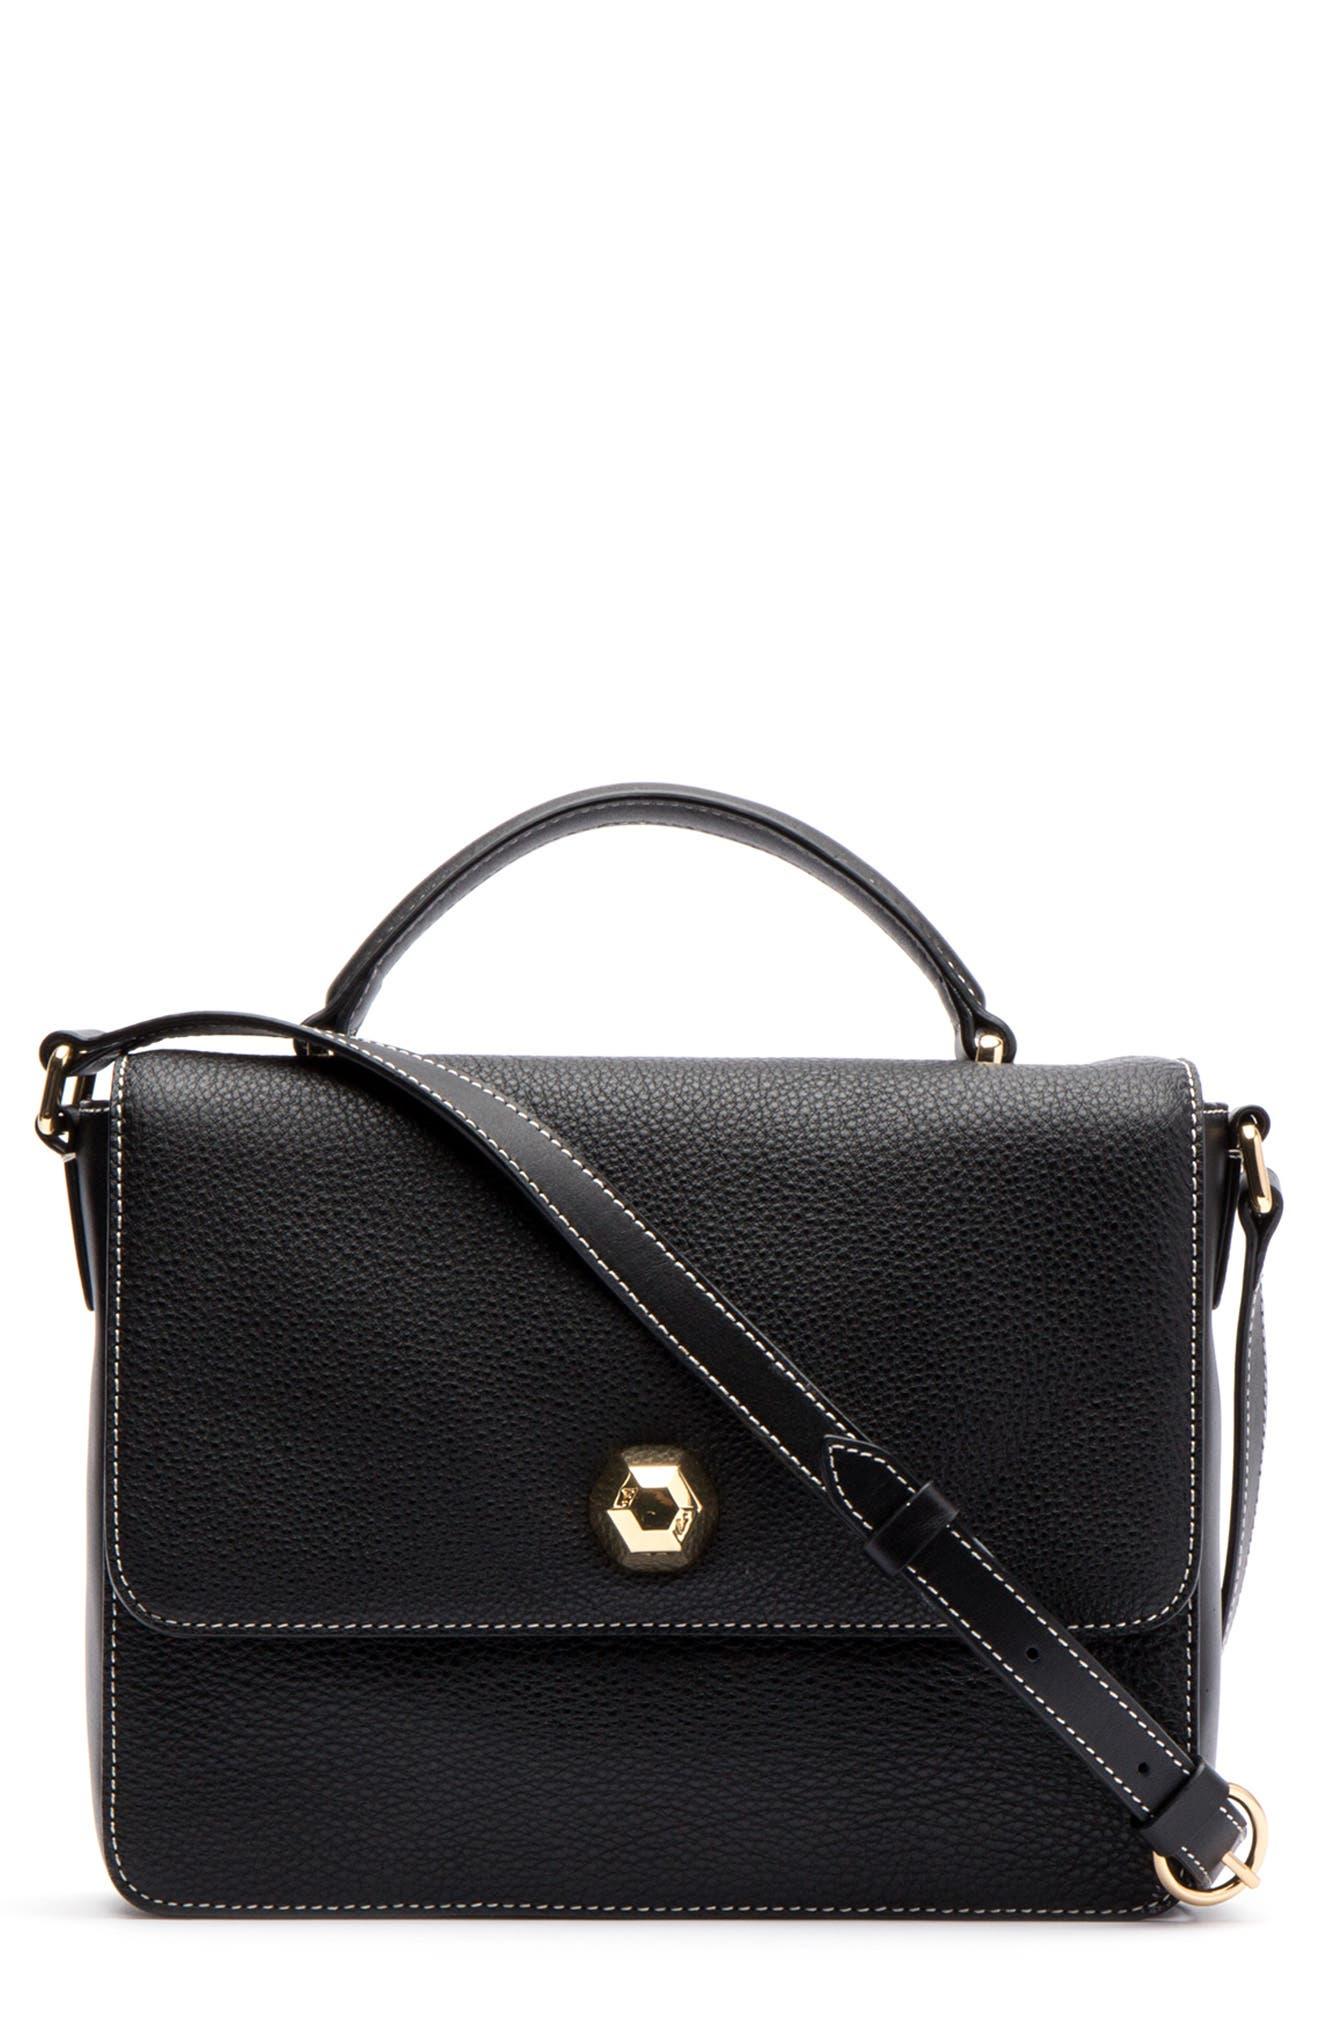 Midge Leather Crossbody Bag,                             Main thumbnail 1, color,                             001